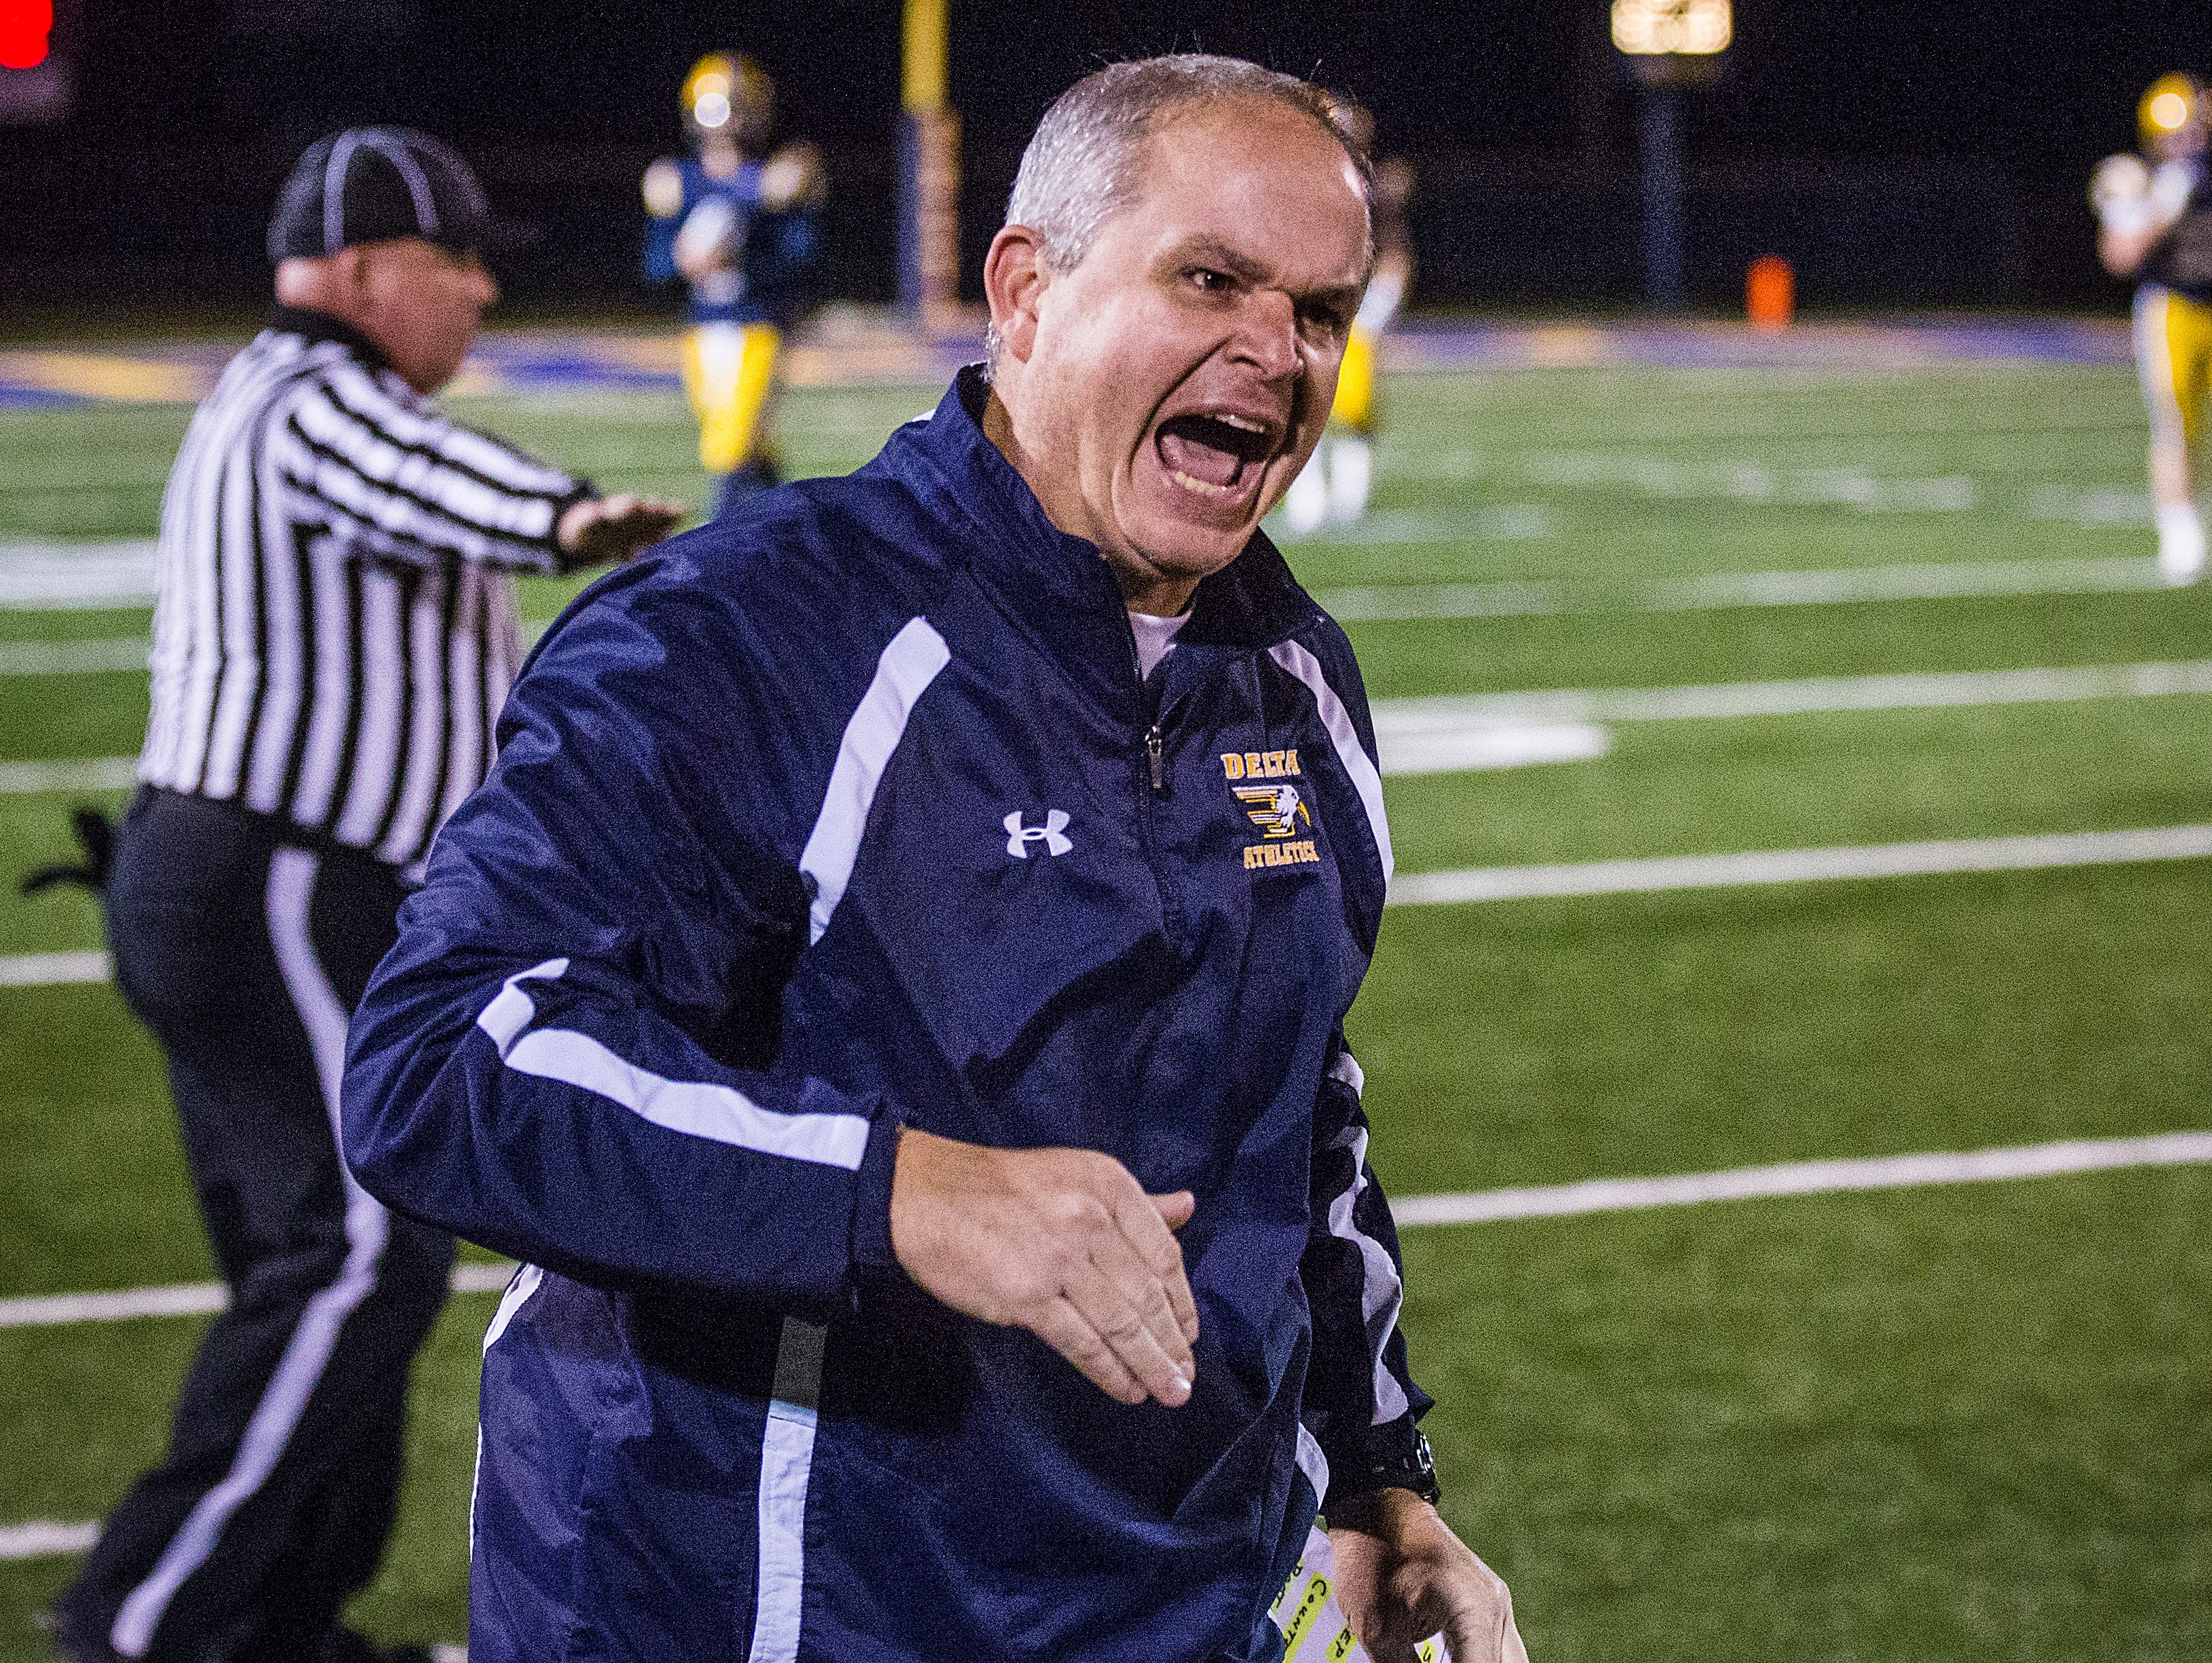 Delta defeated Pendleton Heights at Delta High School Friday, Nov. 6, 2015.